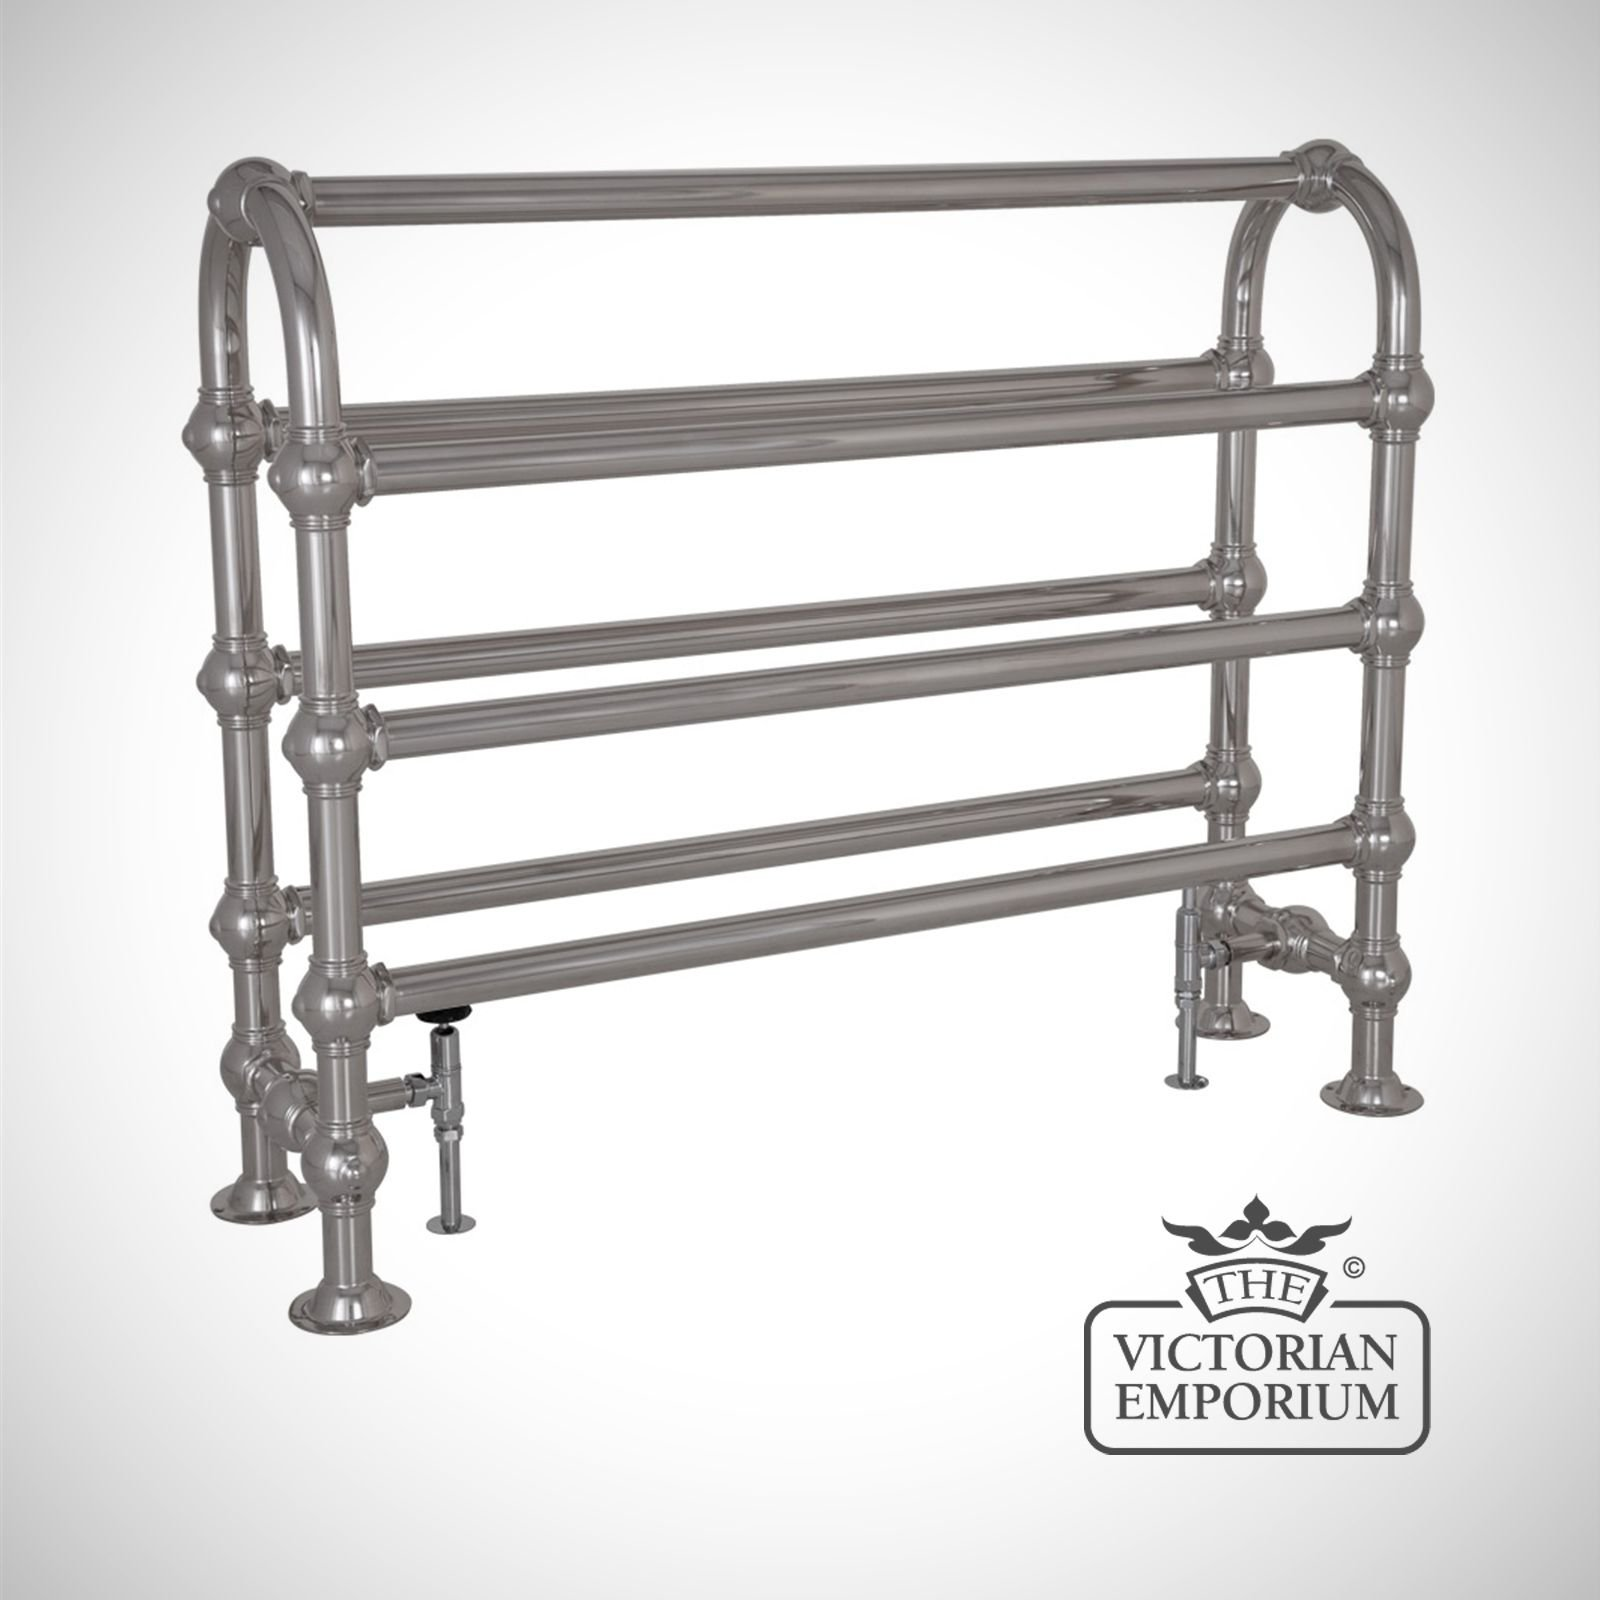 Carron Colossus Horse Steel Towel Rail For Sale: Grande Horse Heated Towel Rail 935x1125mm